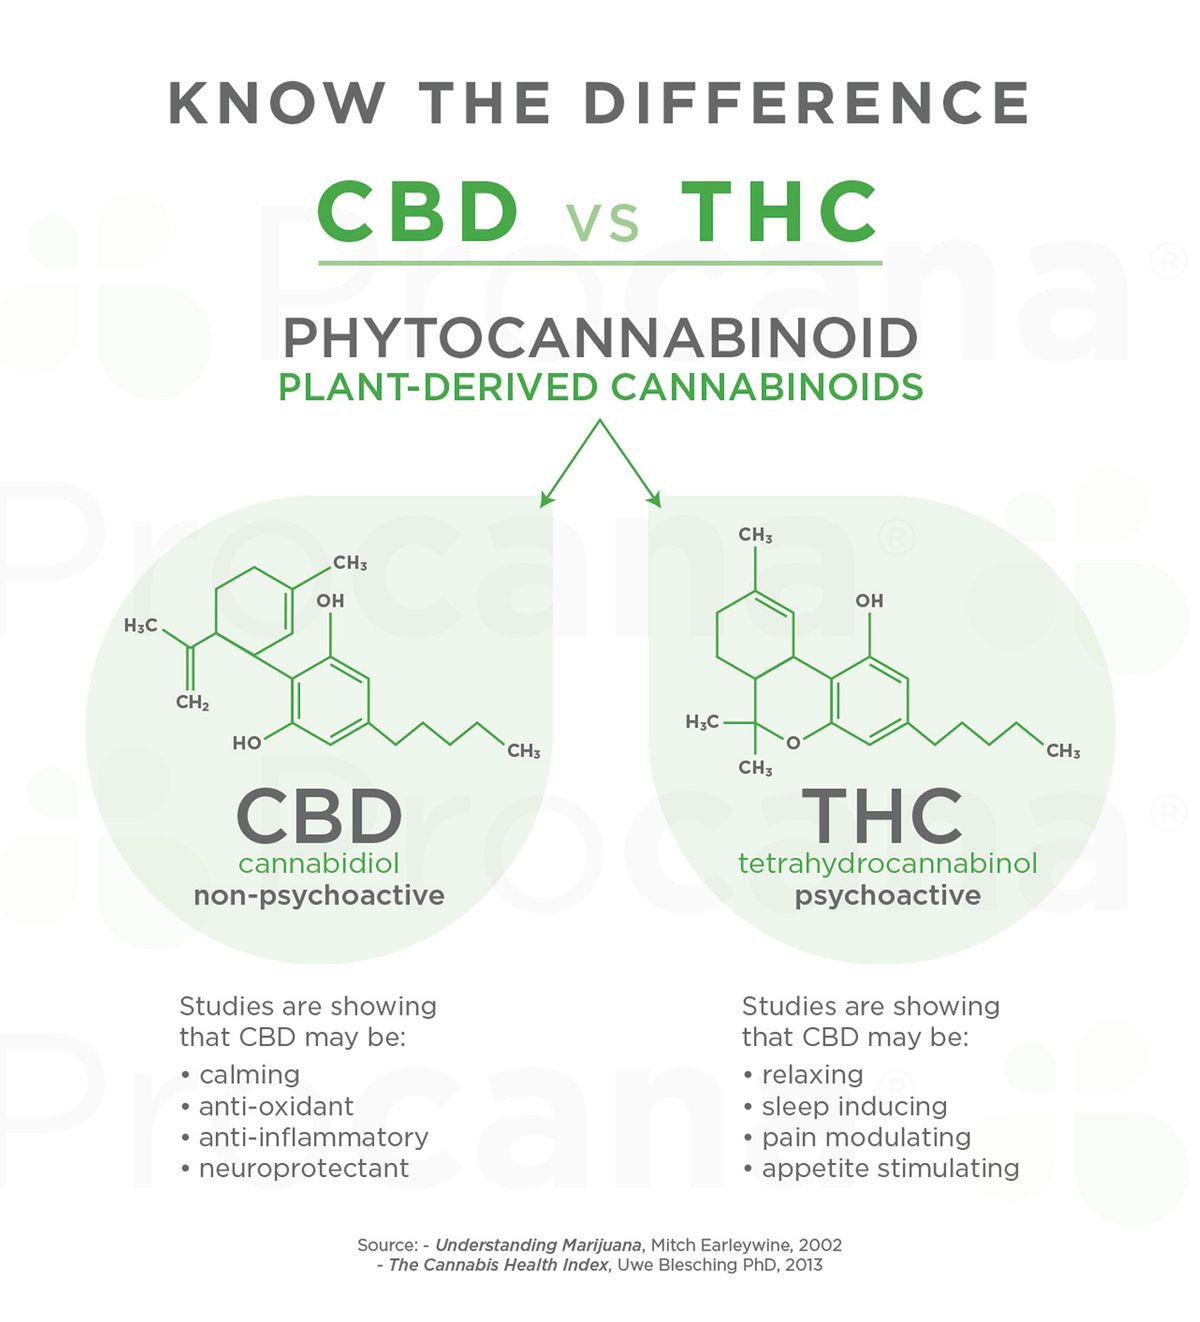 Procana_CBD vs THC.jpg